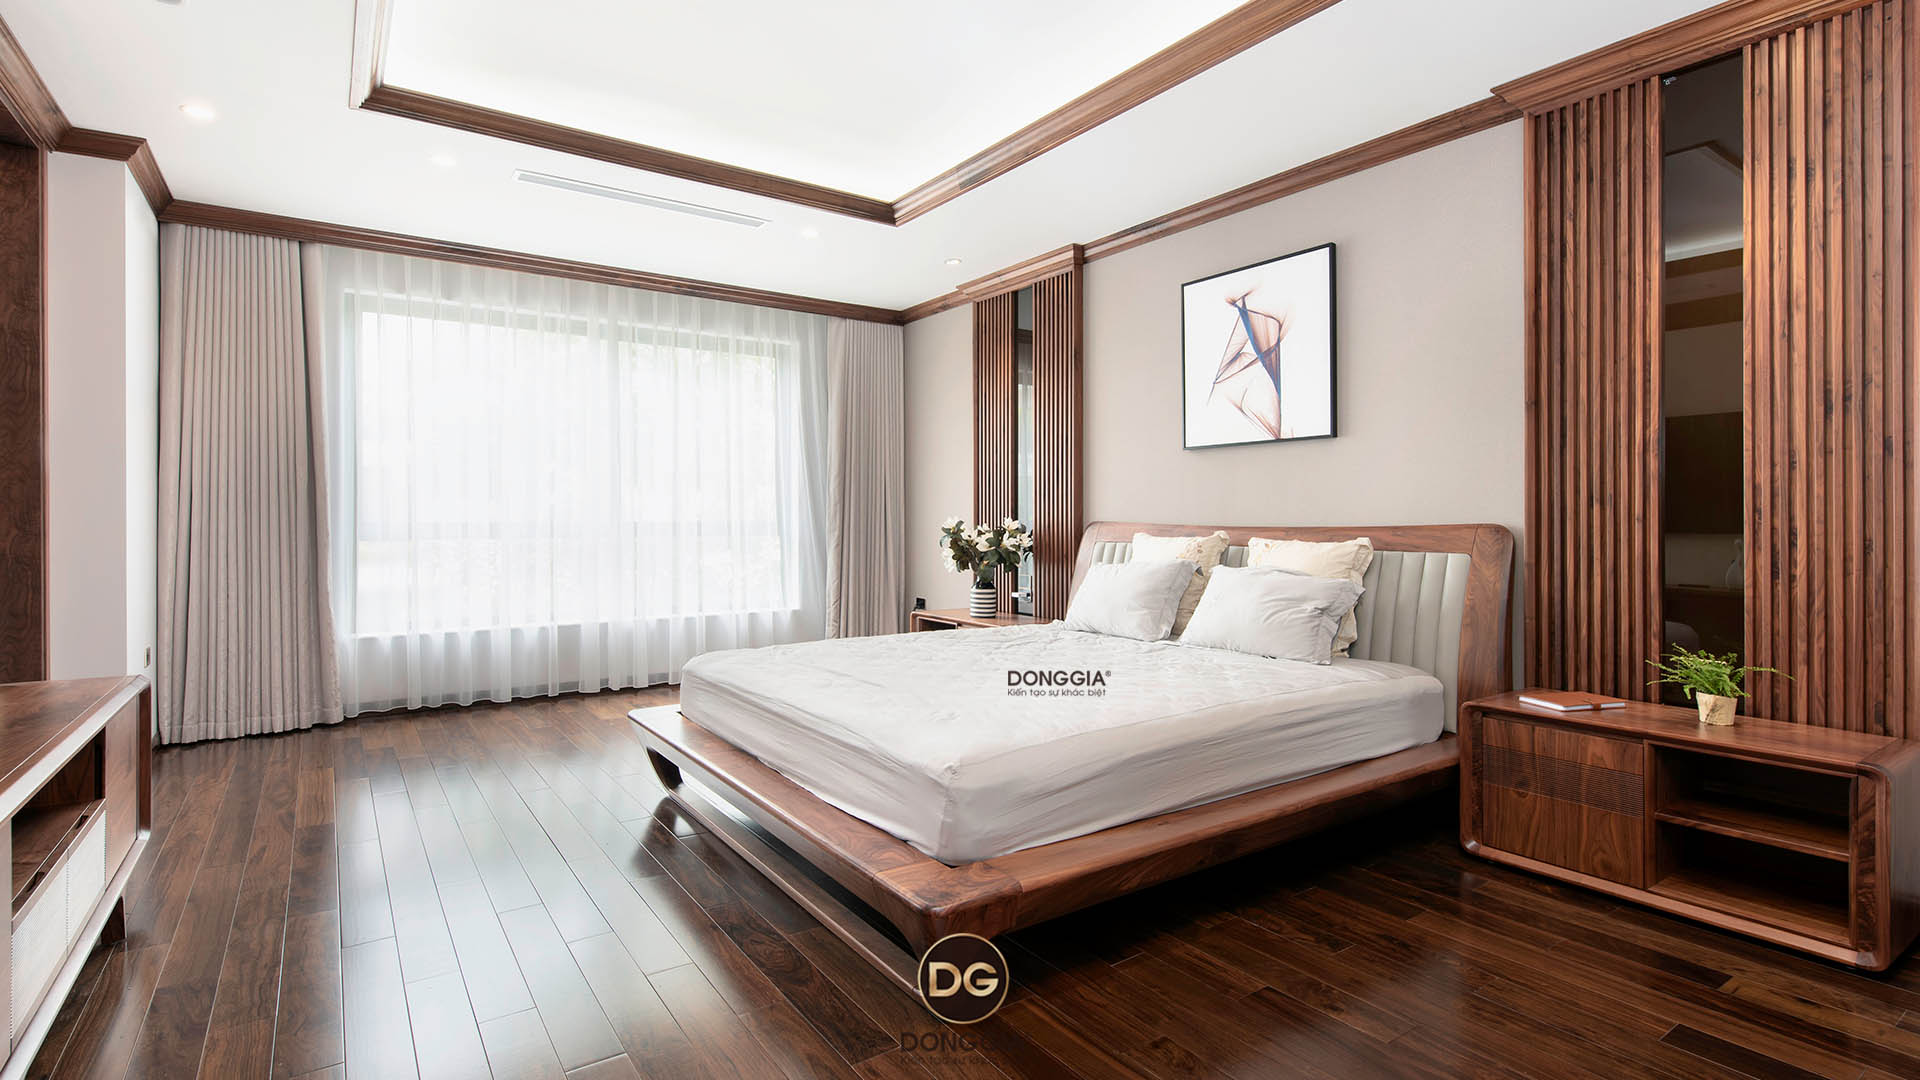 noi-that-go-oc-cho-tu-nhien-dong-gia (3)